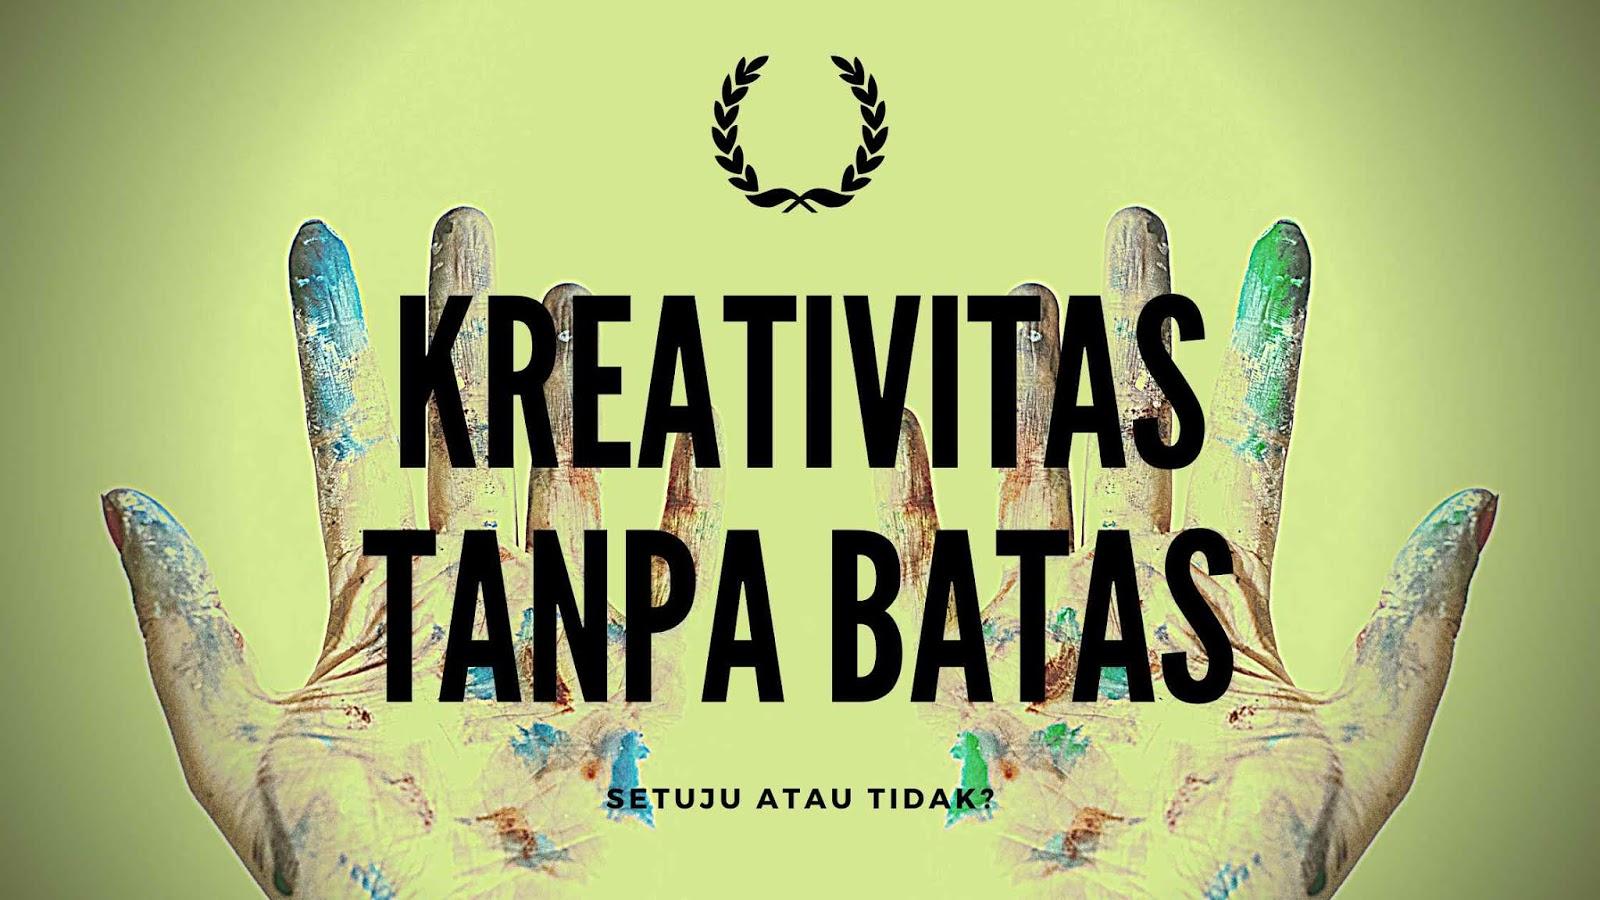 Kreativitas tanpa batas